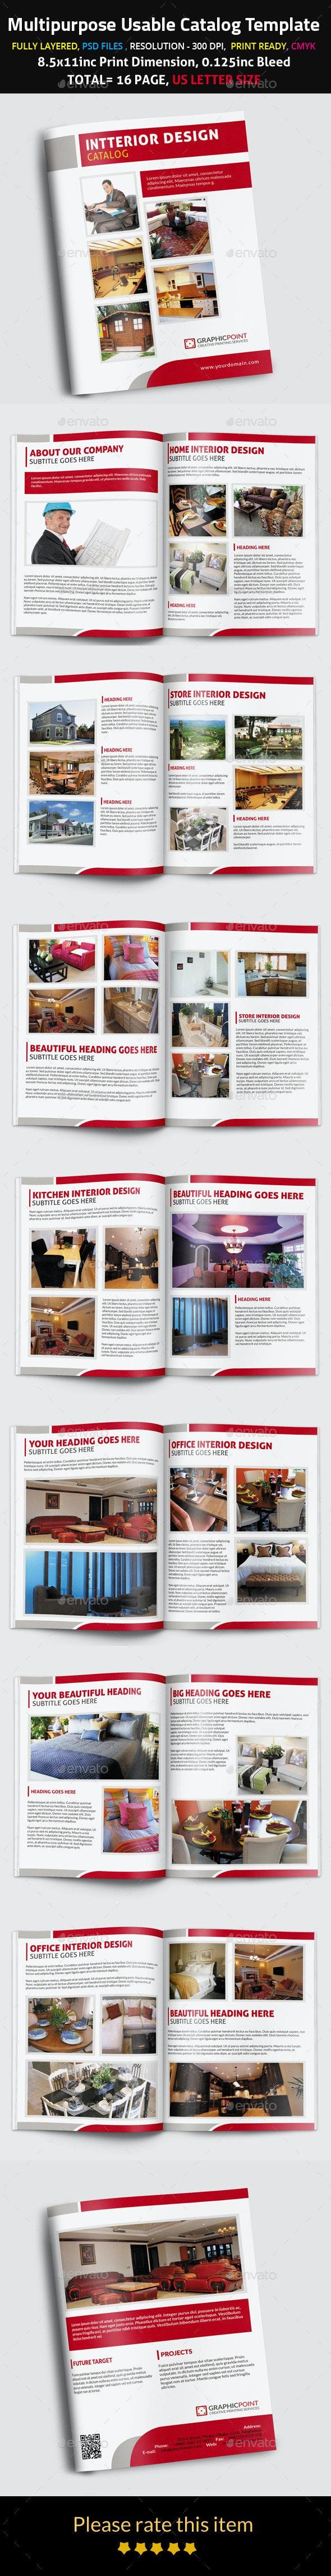 Multipurpose Usable Catalog Template - Brochures Print Templates